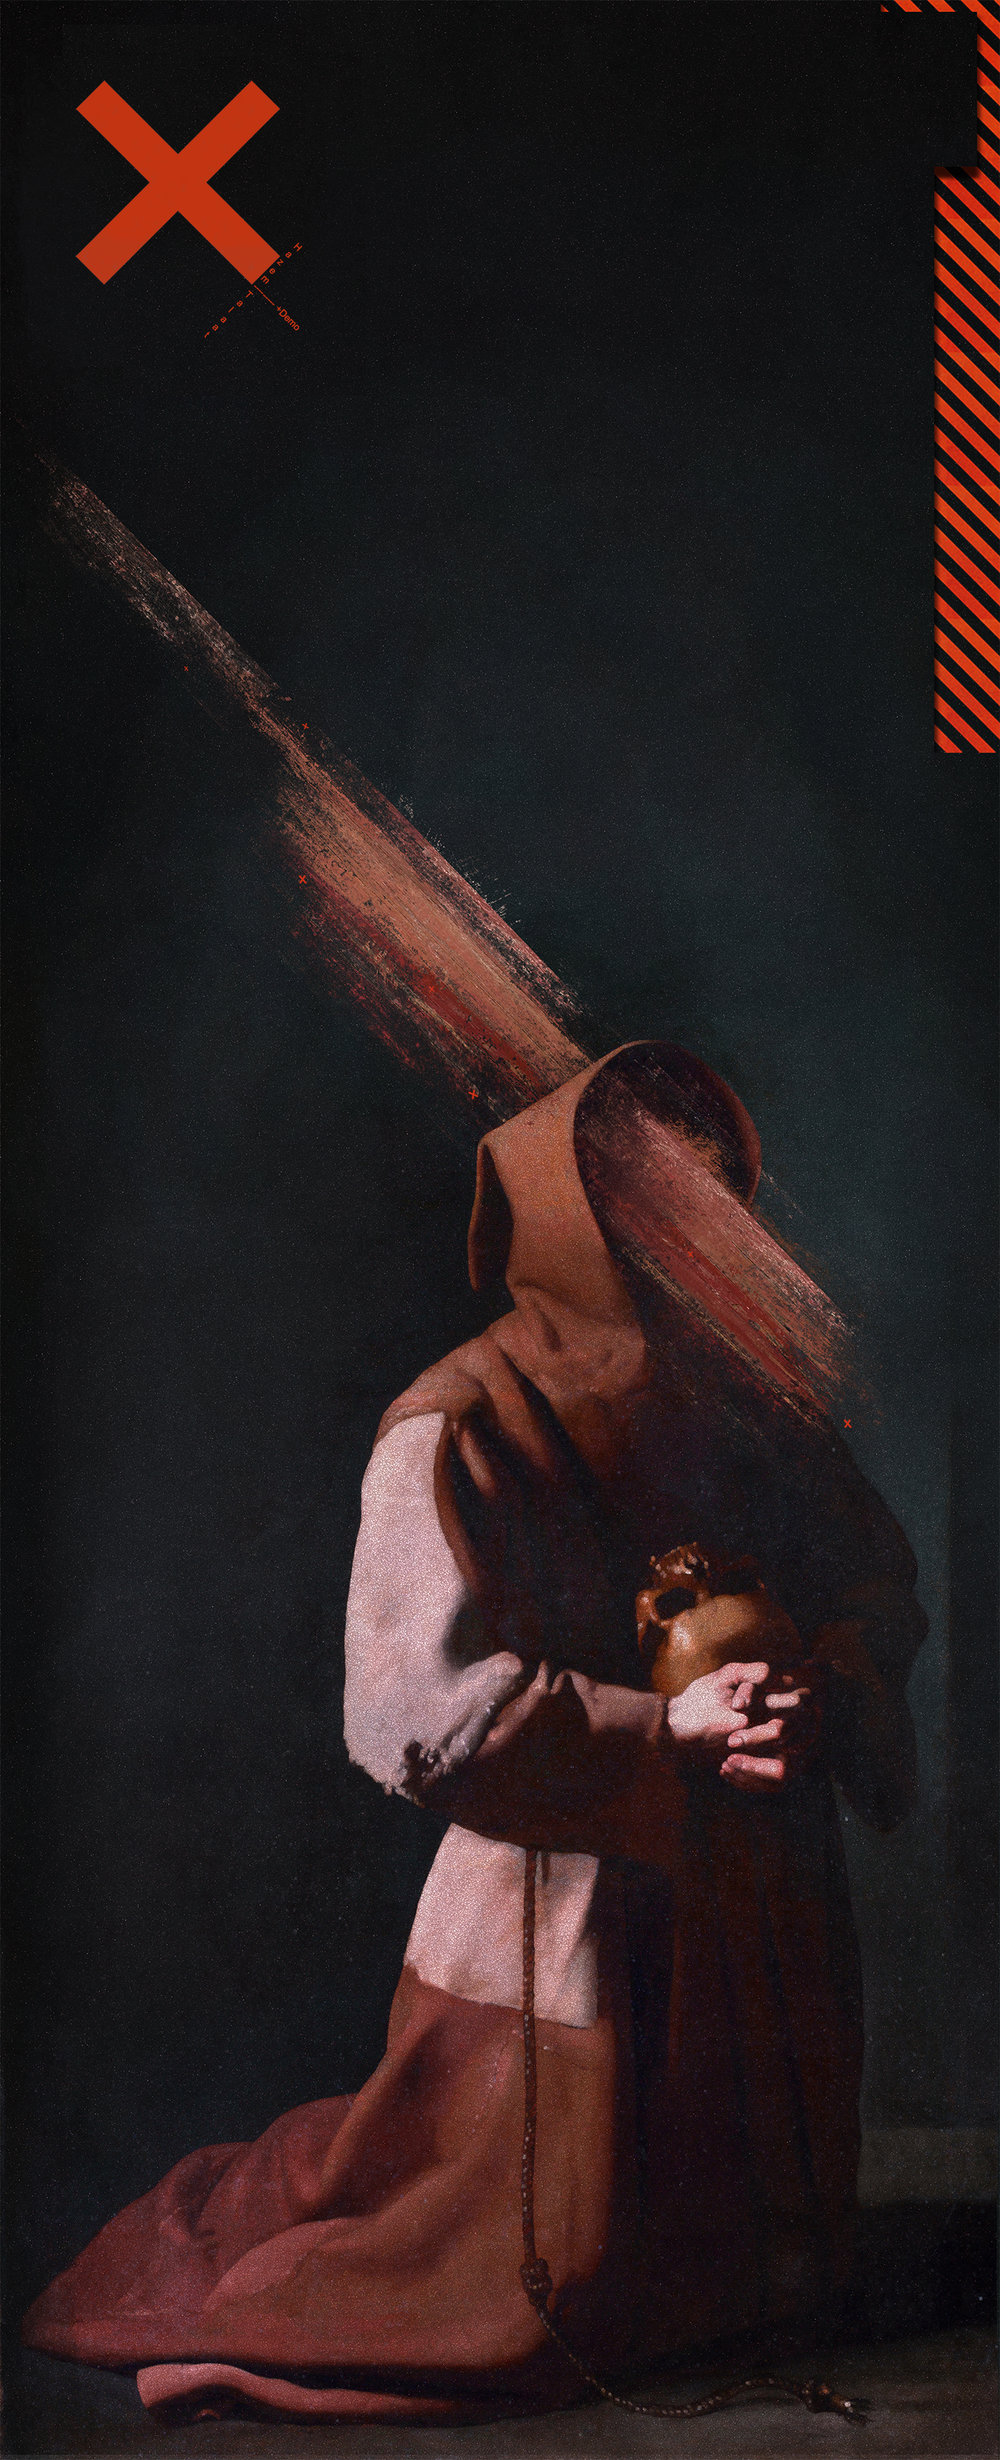 repainting rembrandt_ digital painting_ artist_hazem talaat_ nicola samori